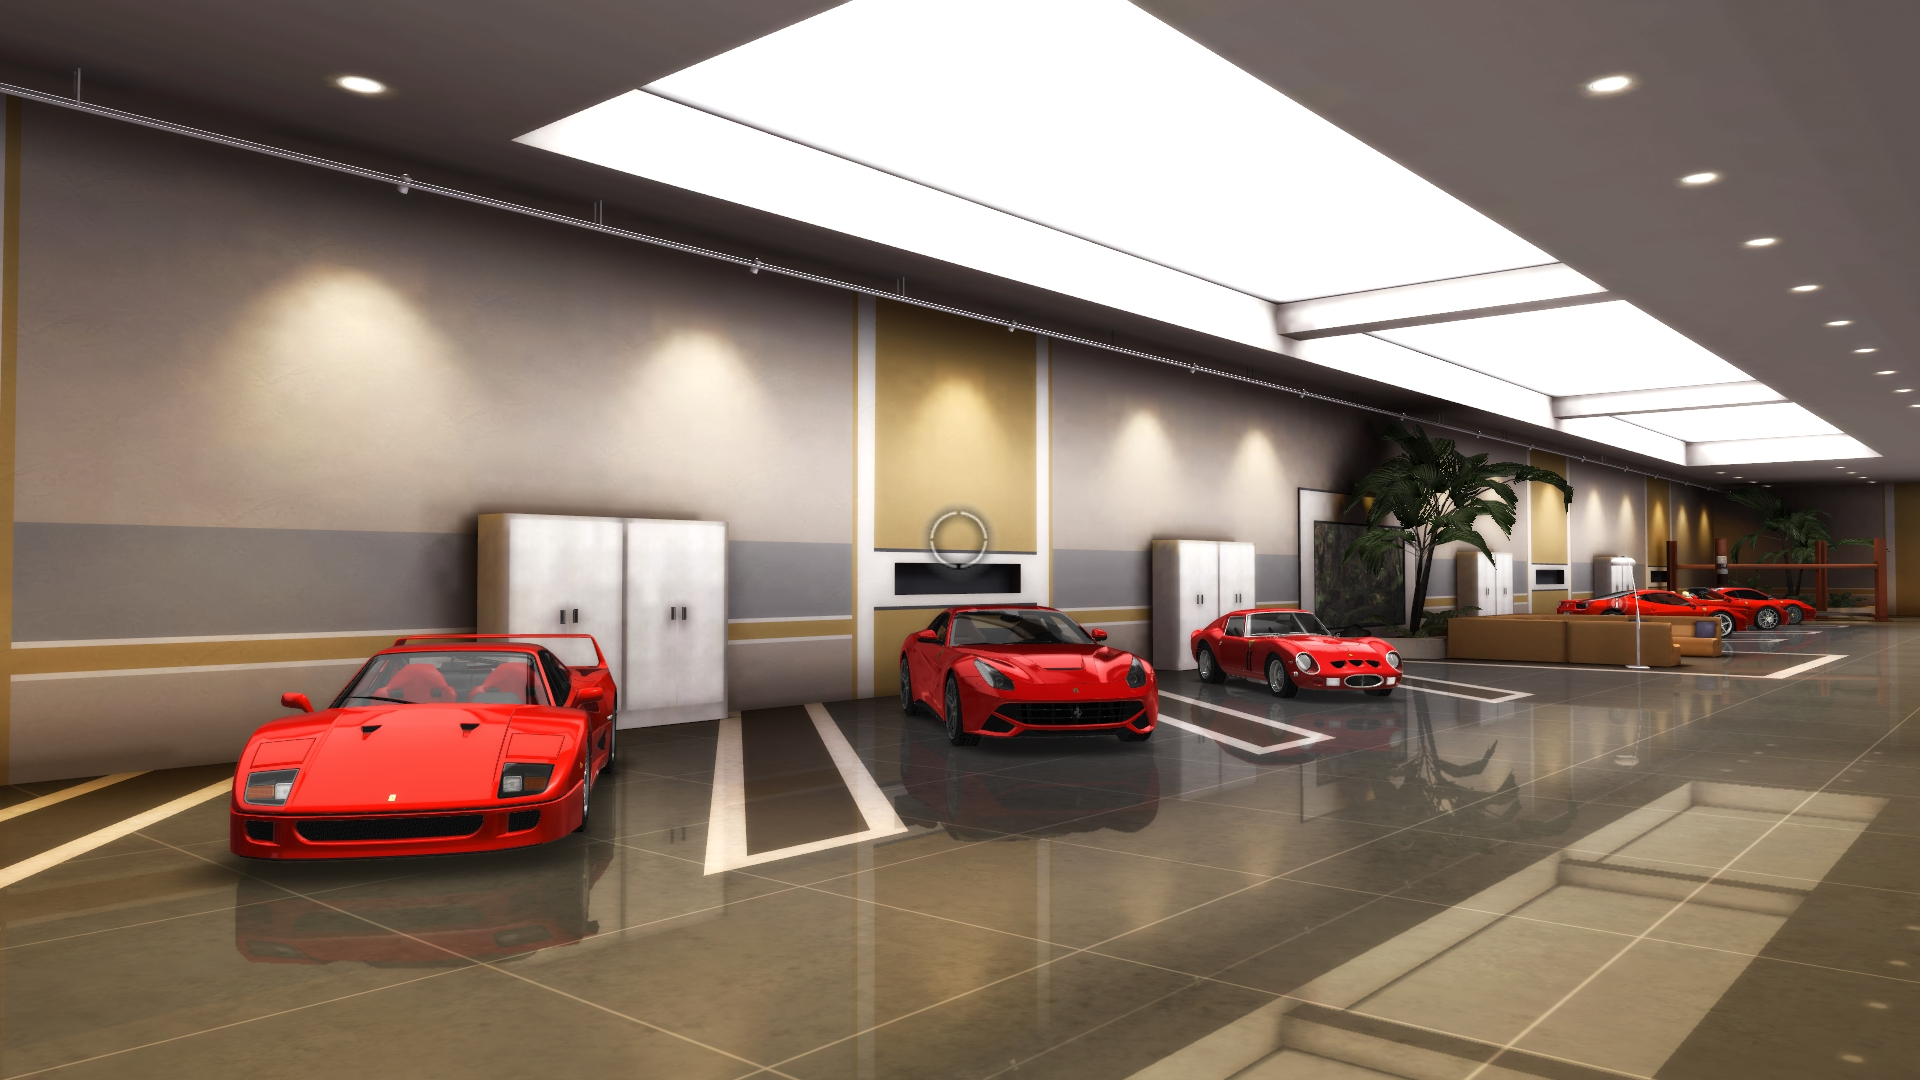 Share your tdu2 garages for Garage ad gap